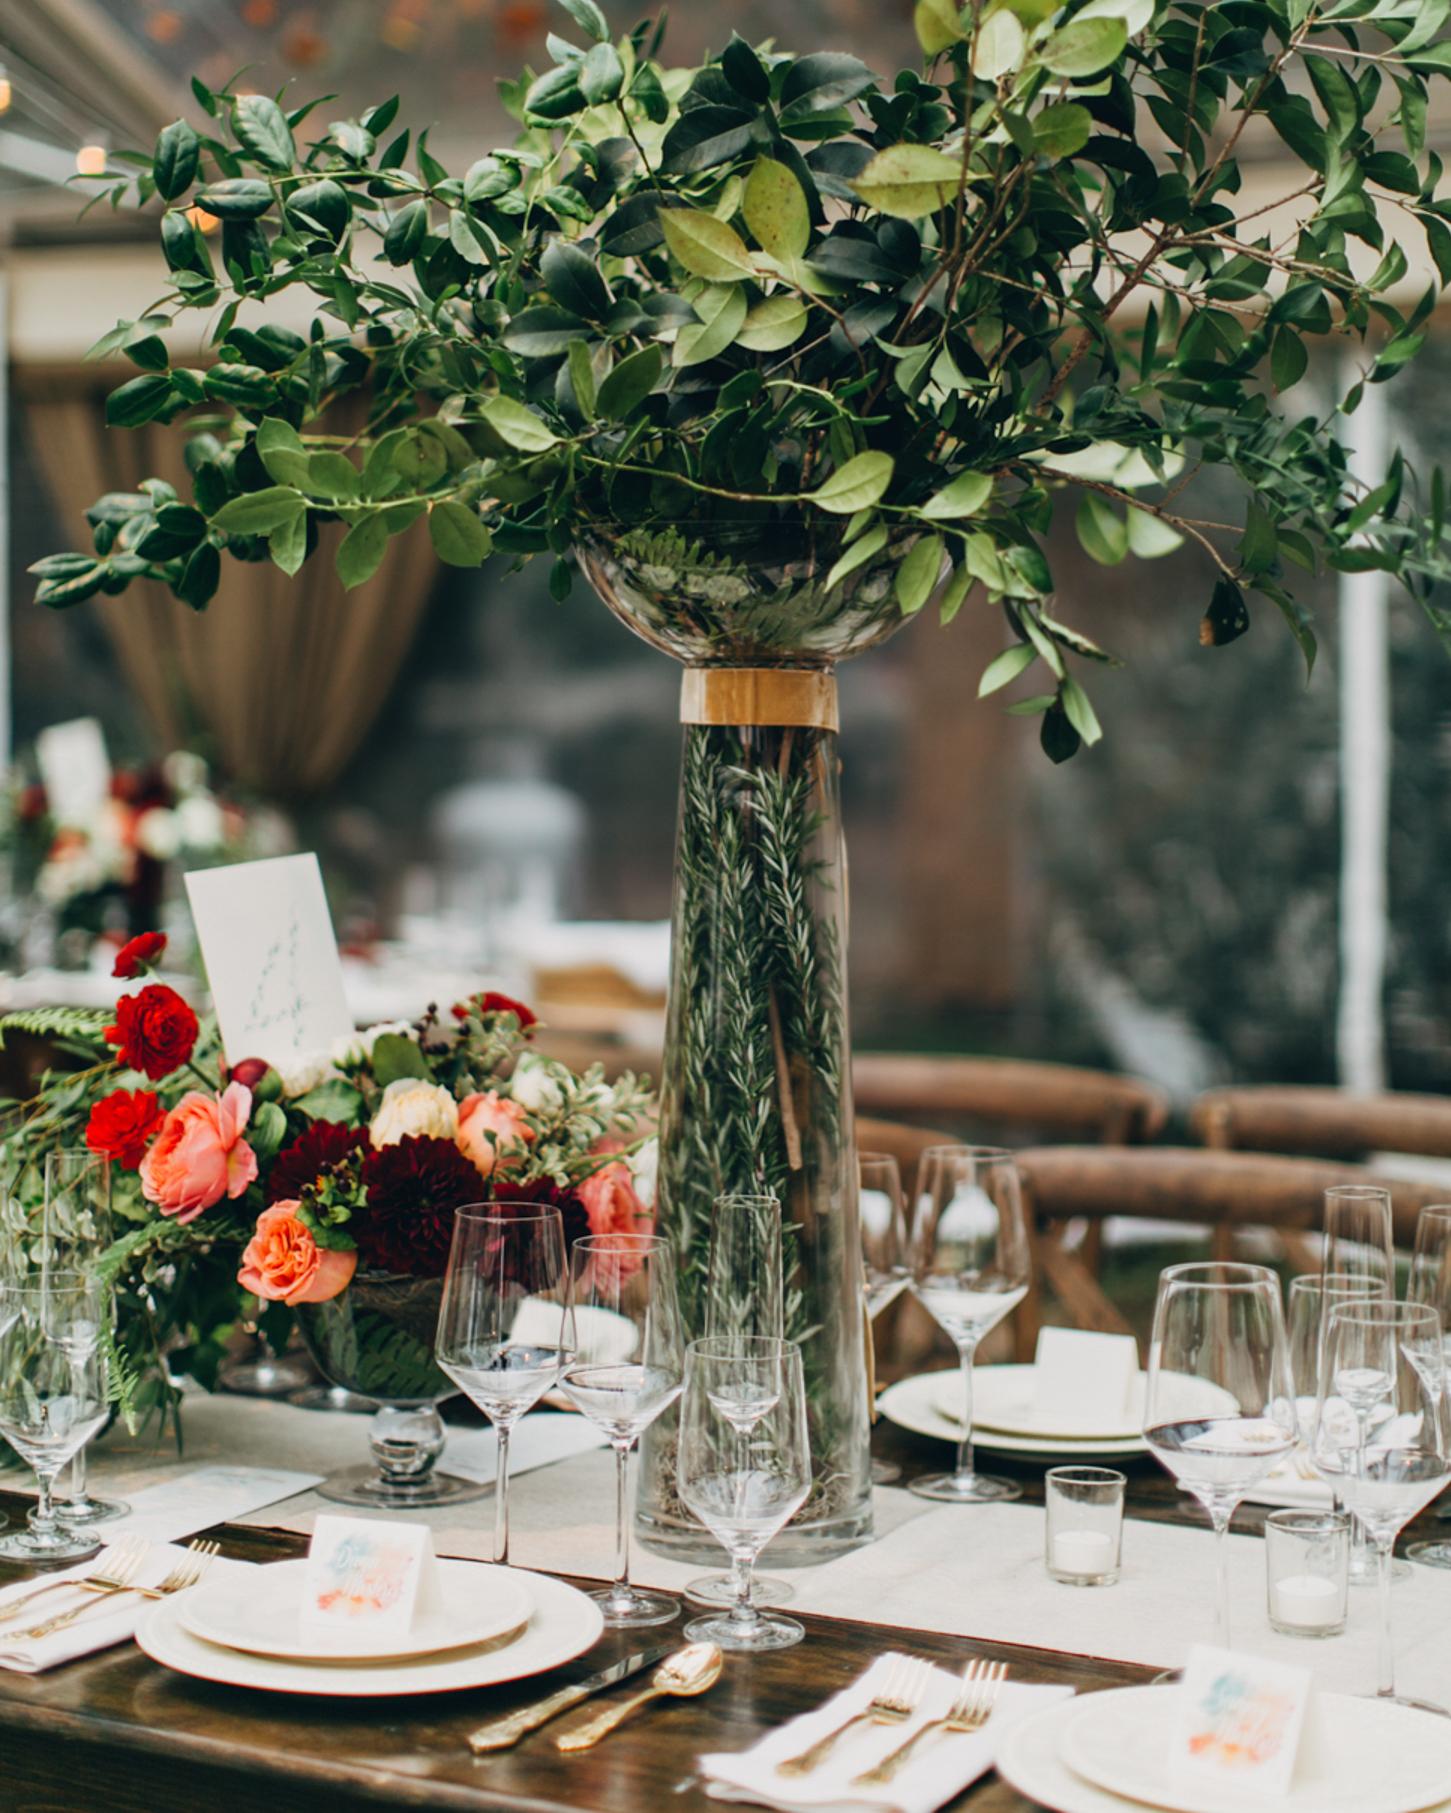 thea-rachit-wedding-centerpiece-0794-s112016-0715.jpg